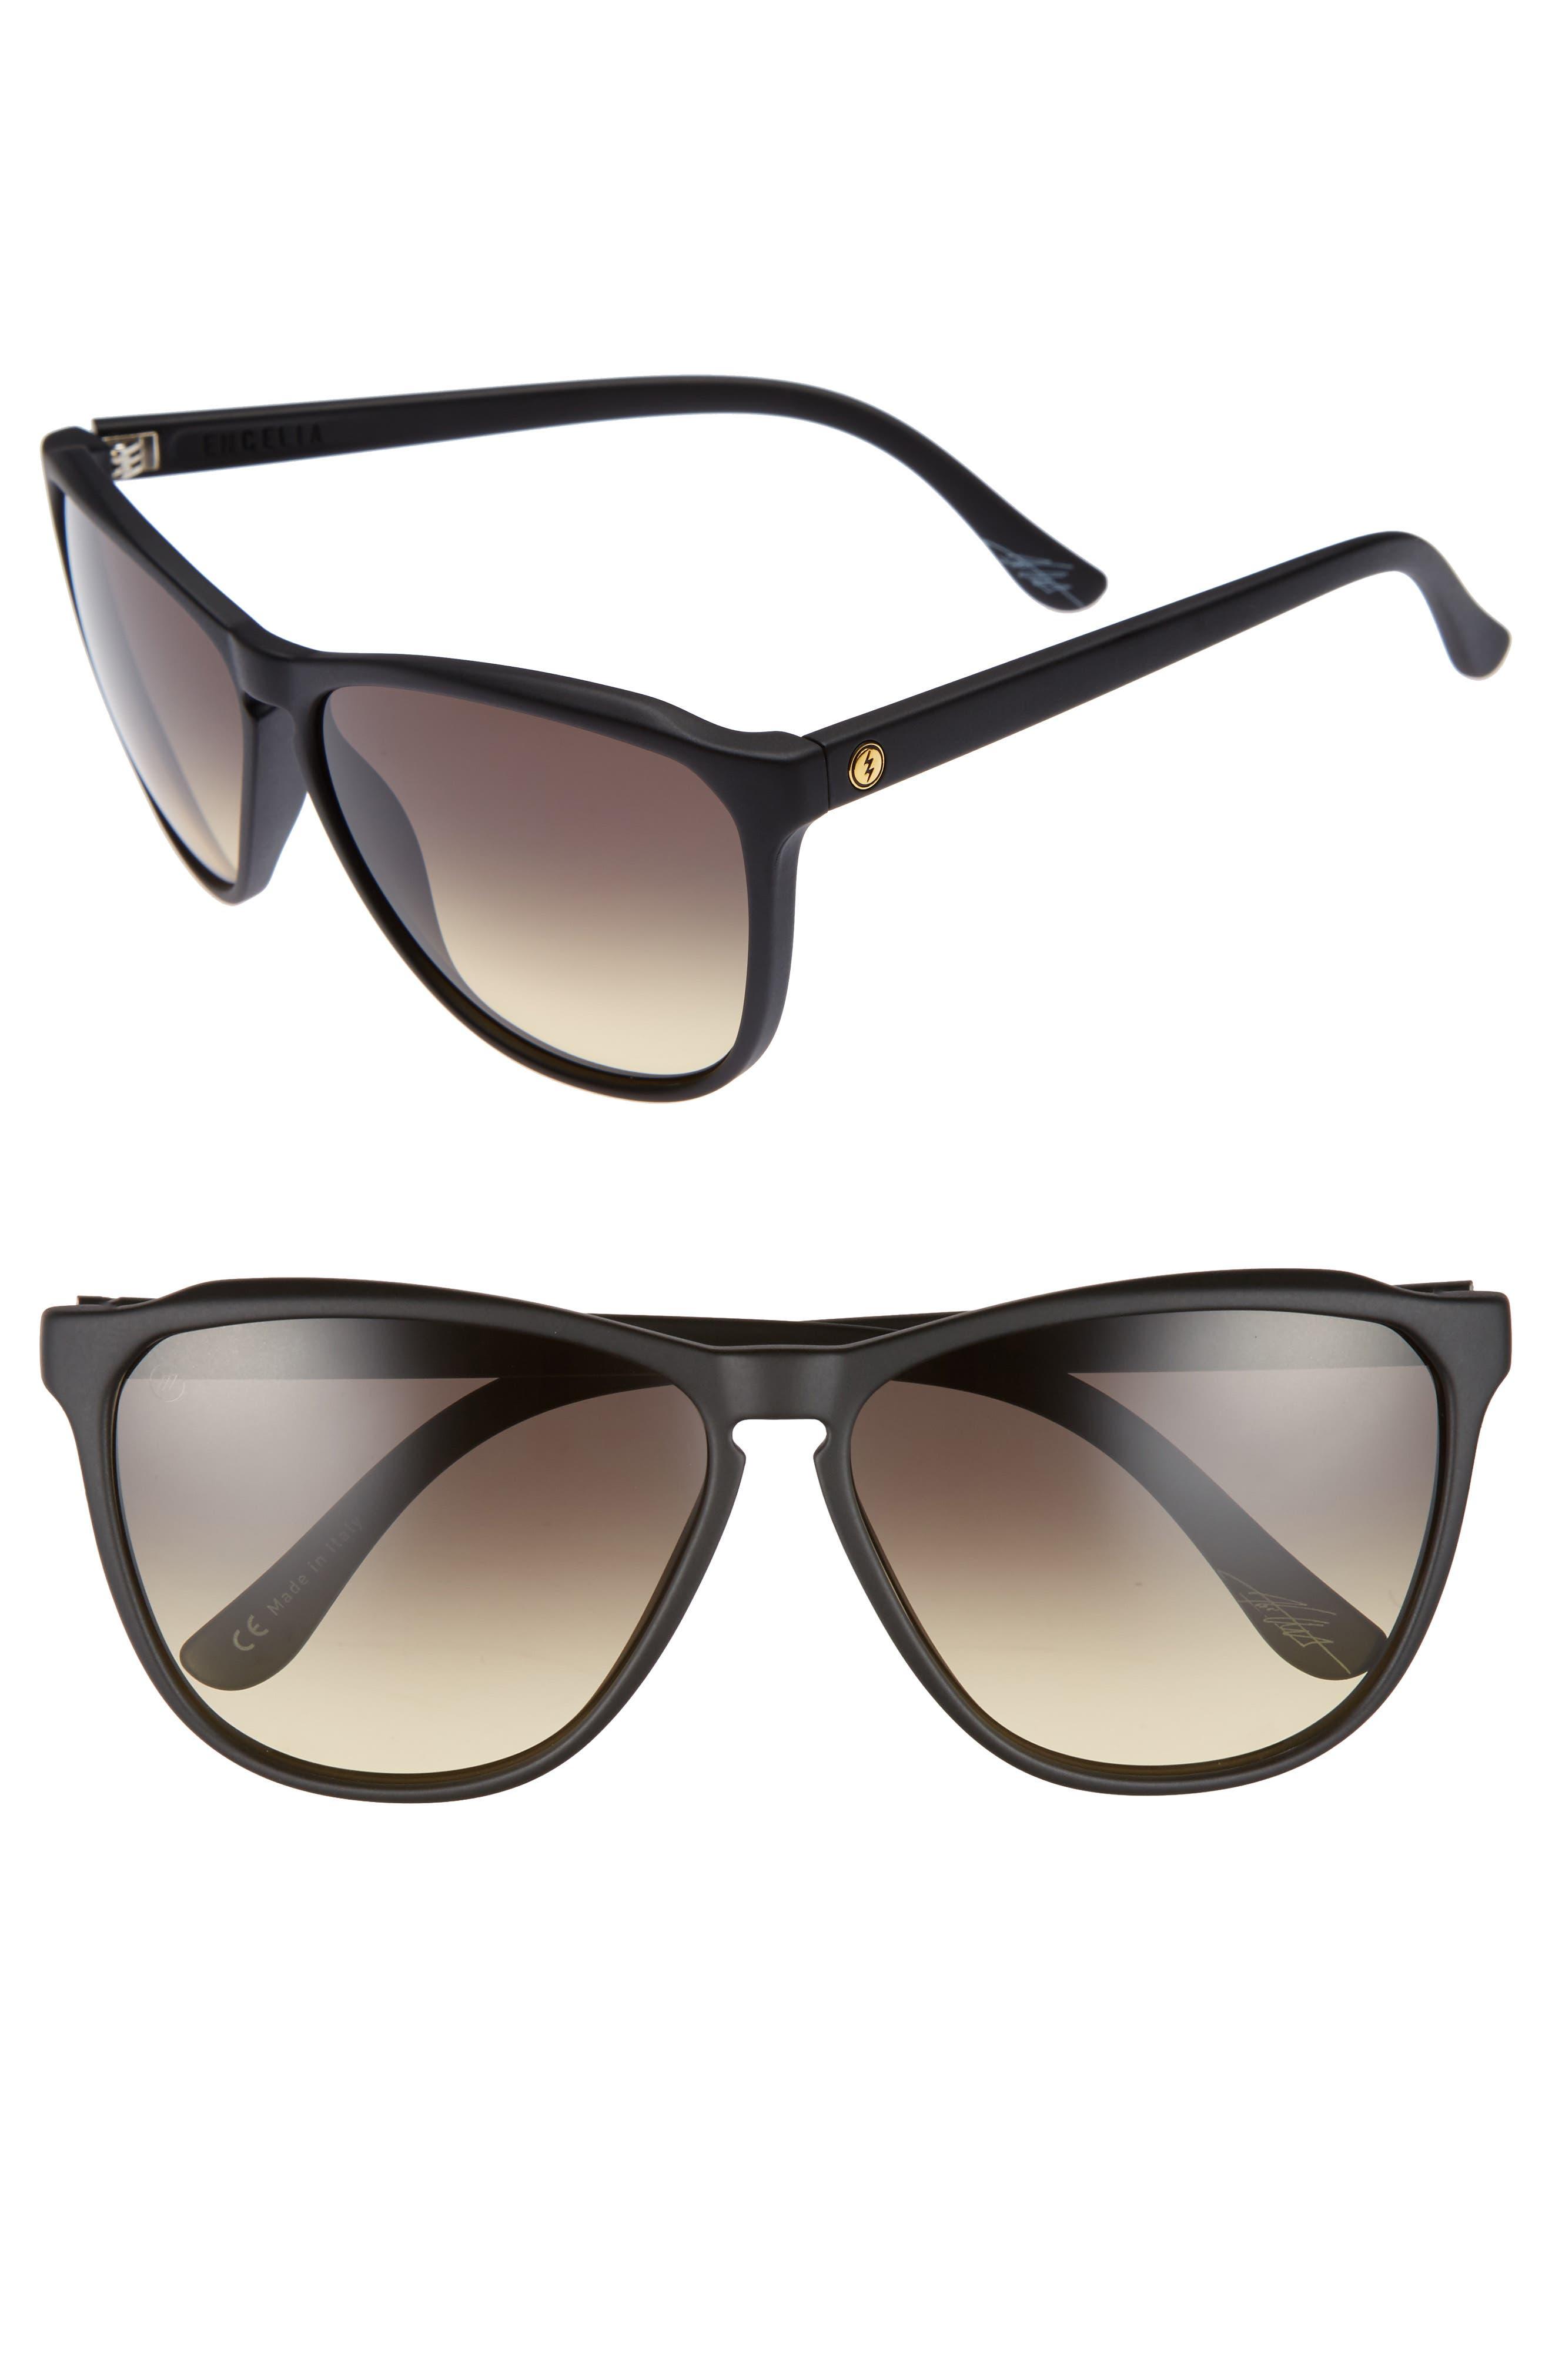 Main Image - ELECTRIC 'Encelia' 66mm Retro Sunglasses